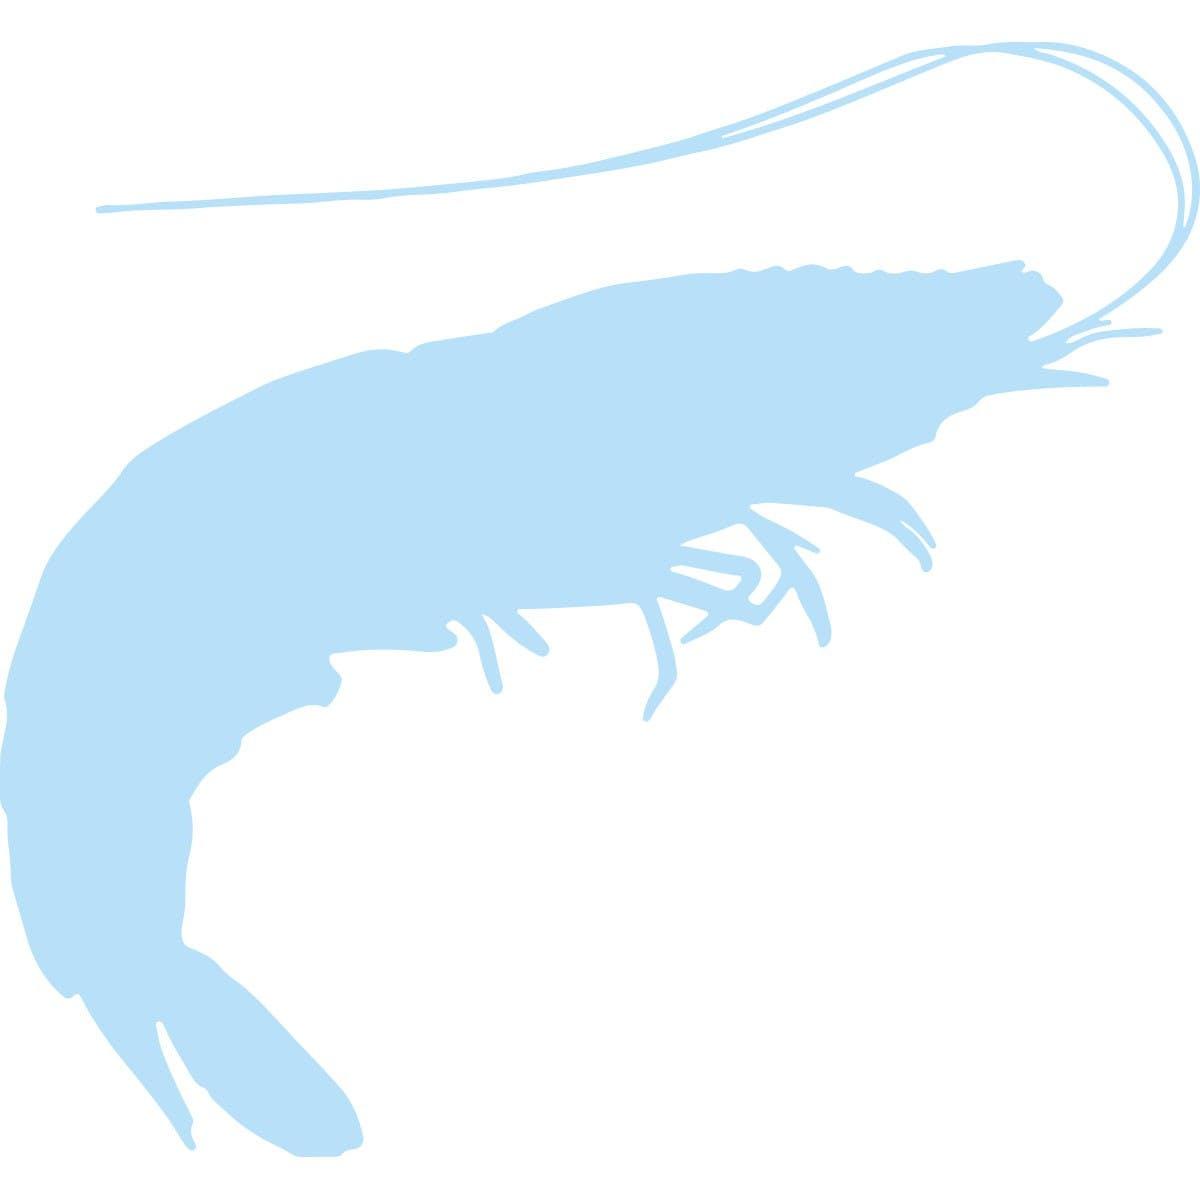 Shrimp Image - 3